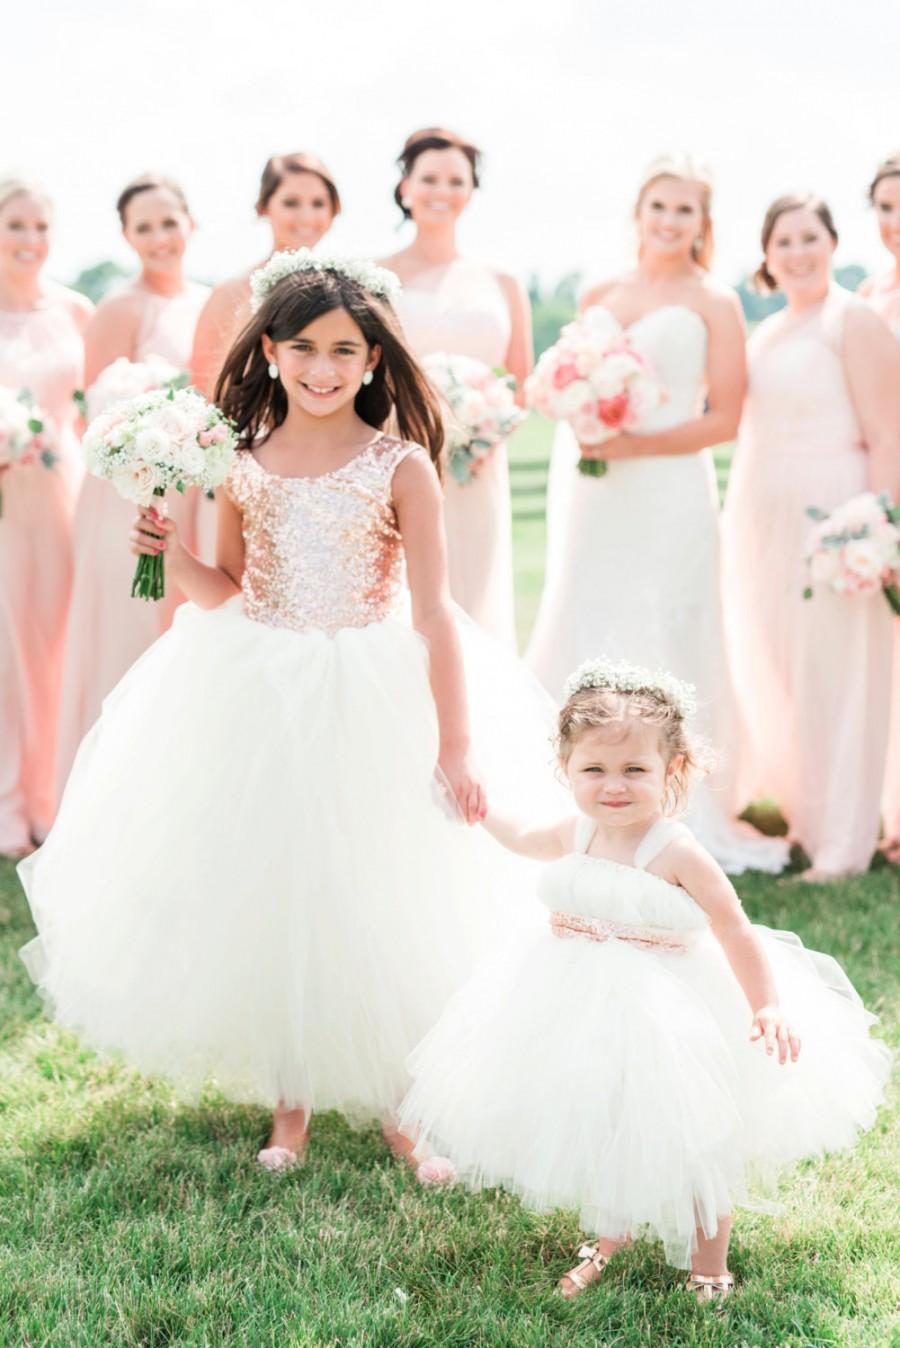 Hochzeit - NEW! The Juliet Dress in Blush and Ivory - Flower Girl Dress